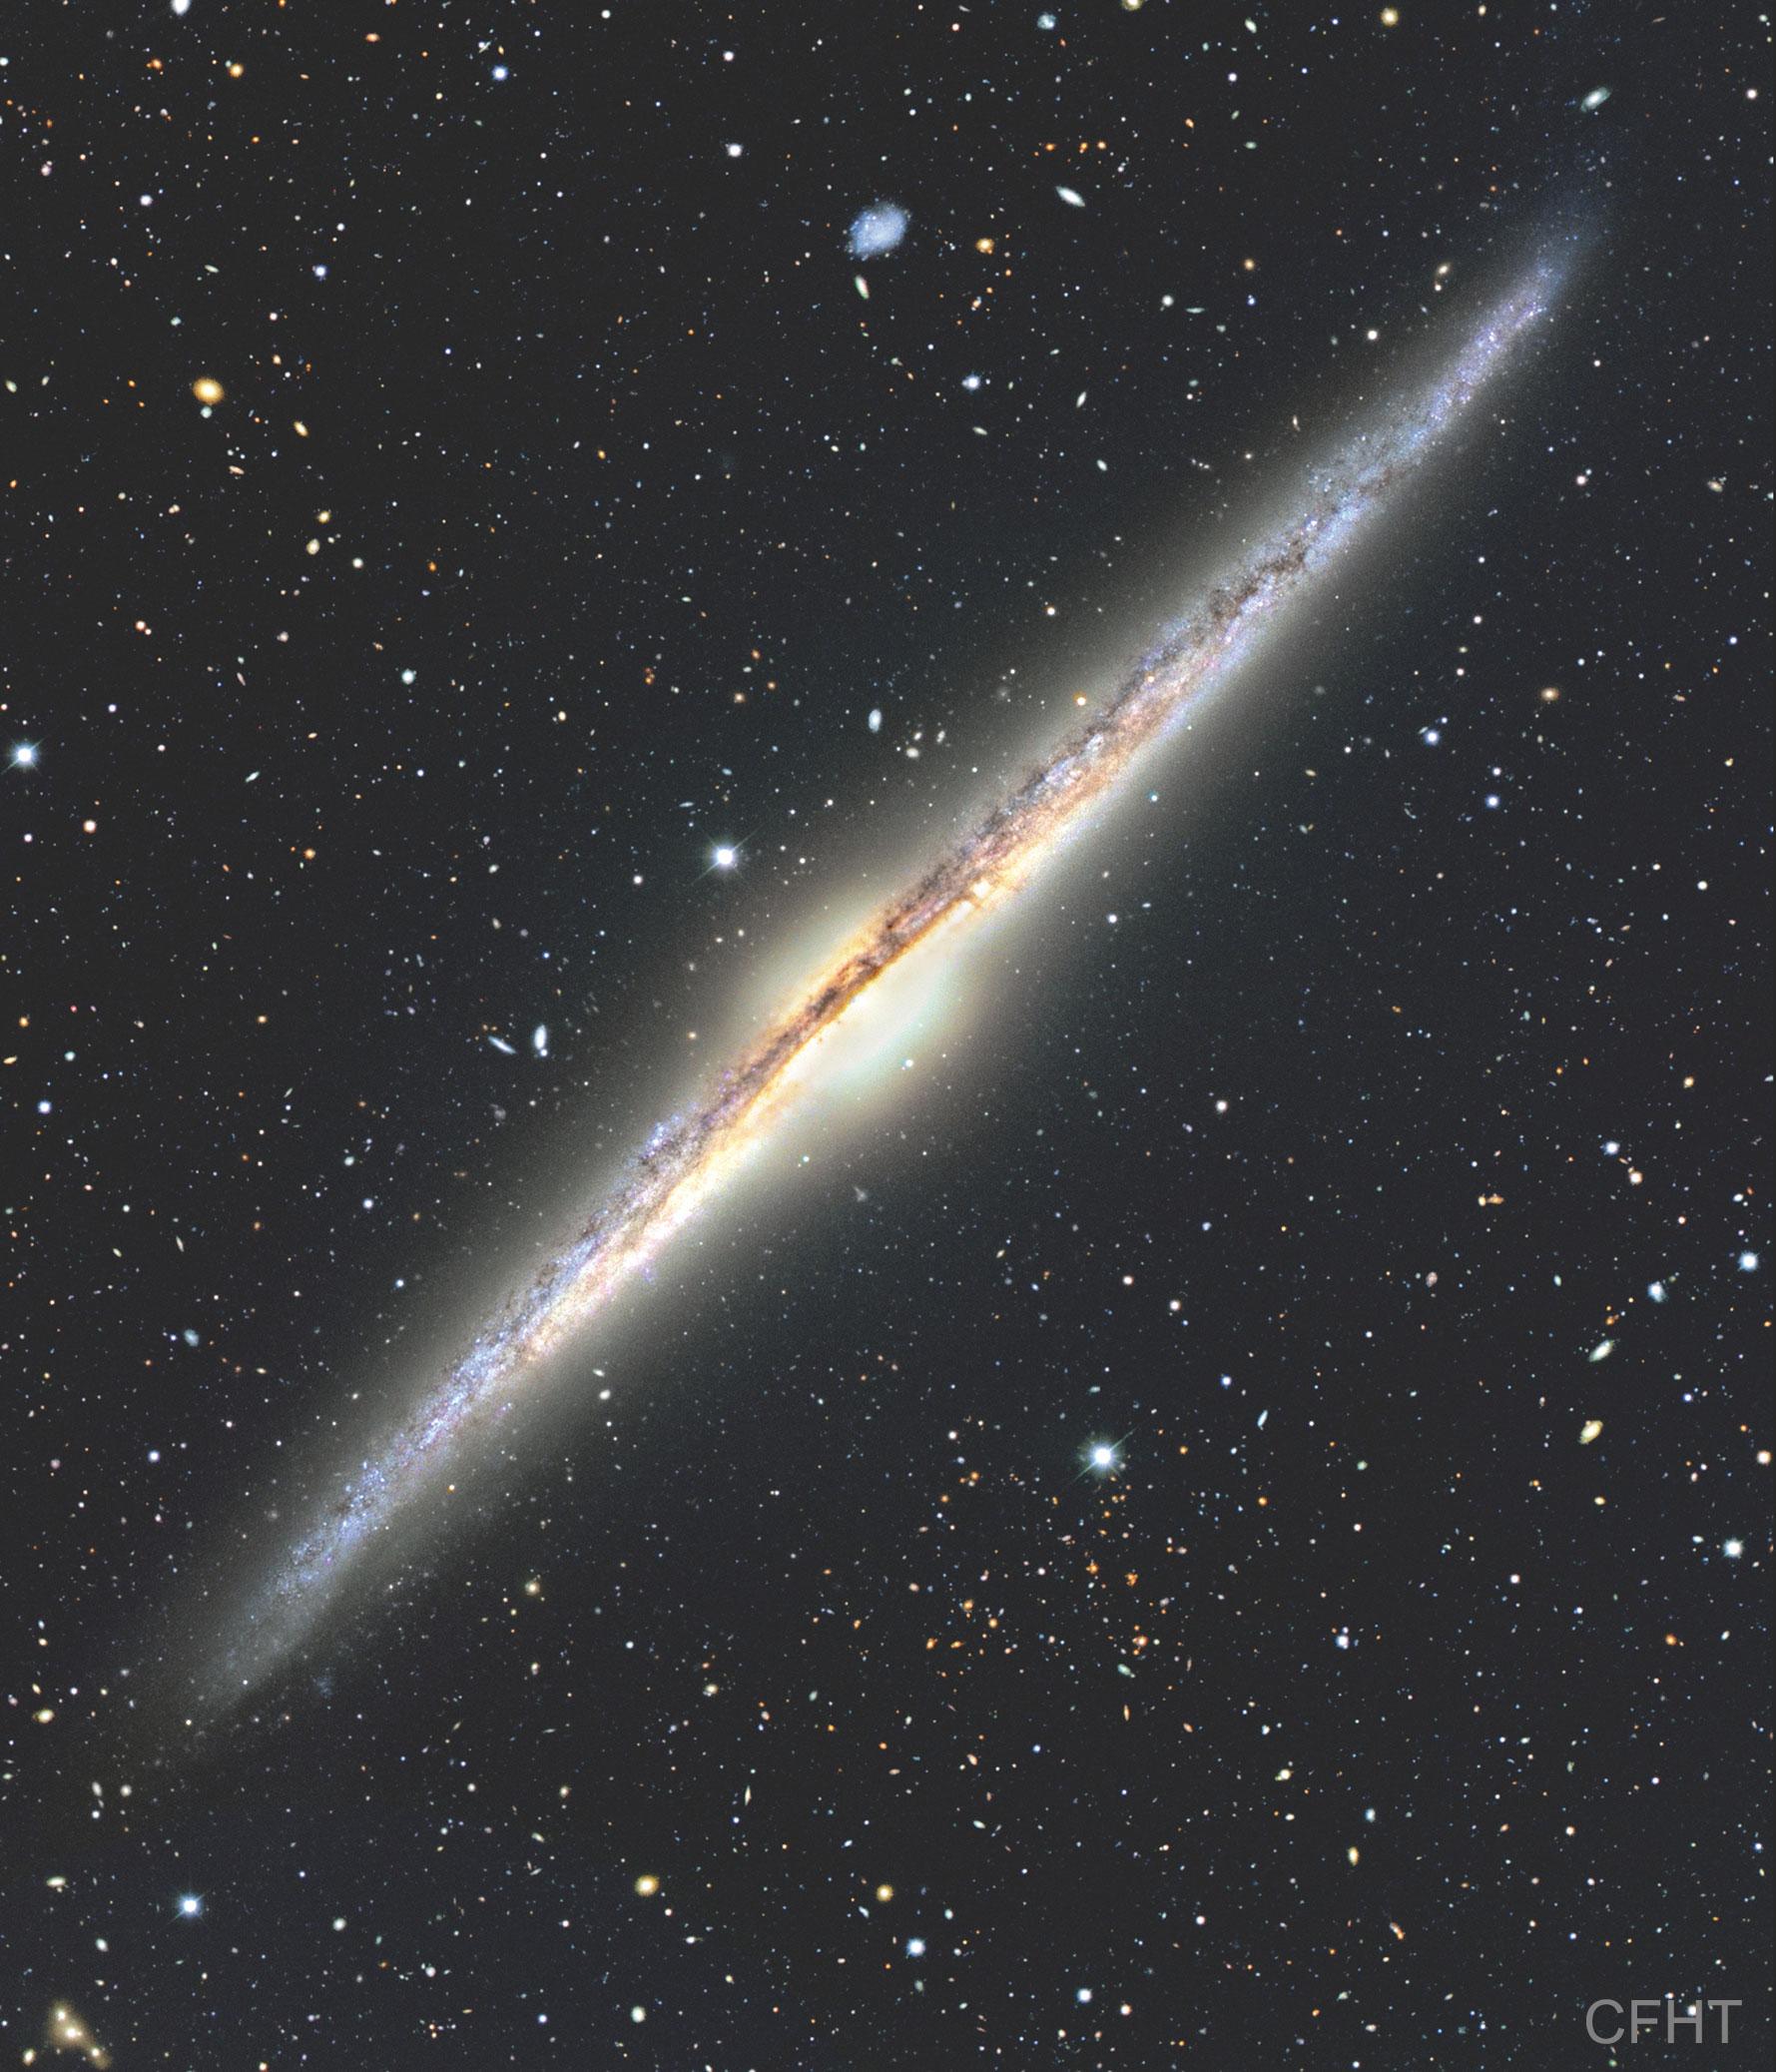 NGC 4565: 坦敧身 ê 星系 ft. 阿錕 (20210517)